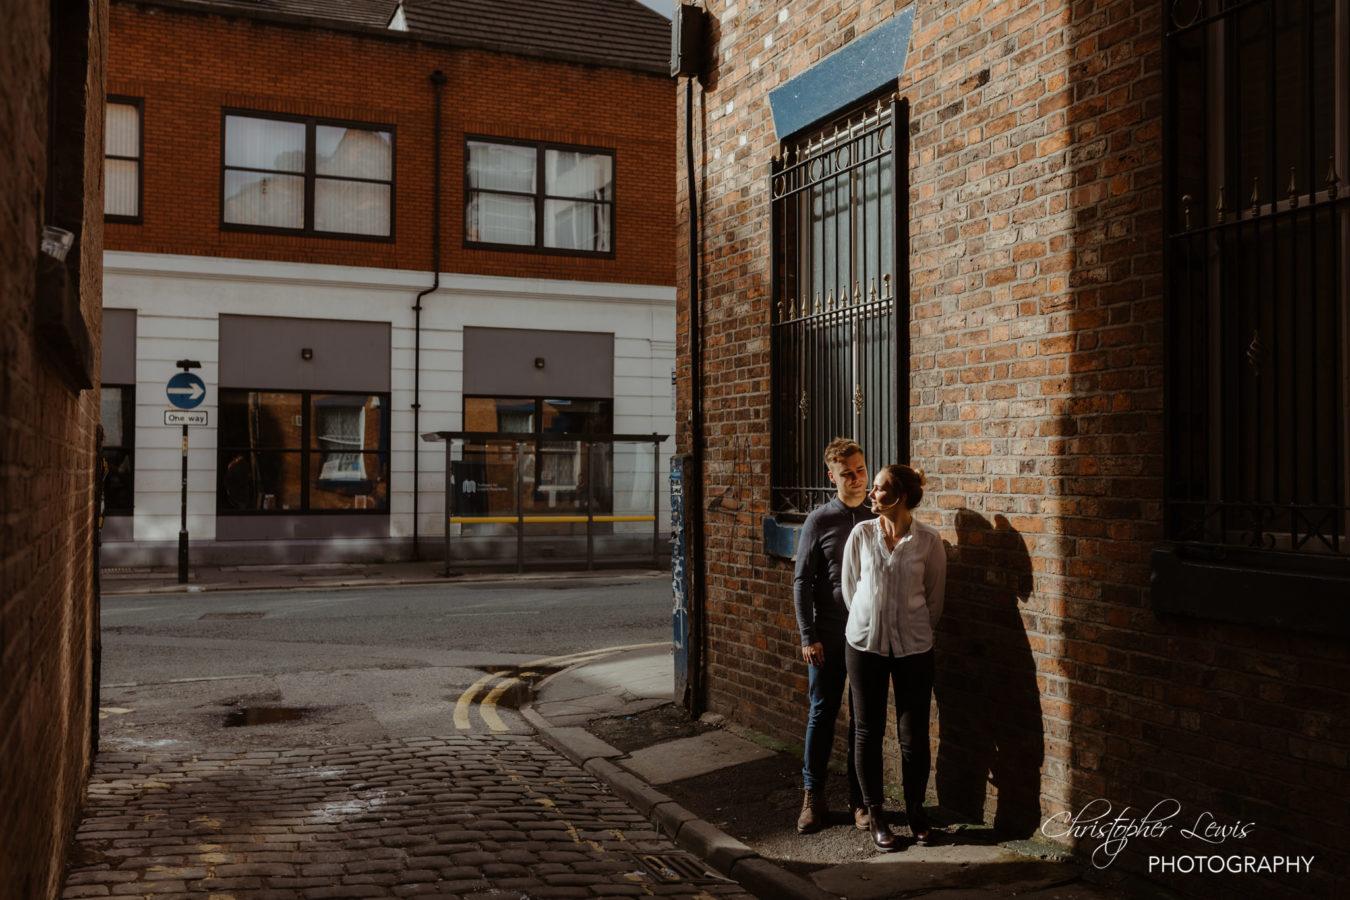 Northern-Quarter-Manchester-Pre-Wedding-Photoshoot-36